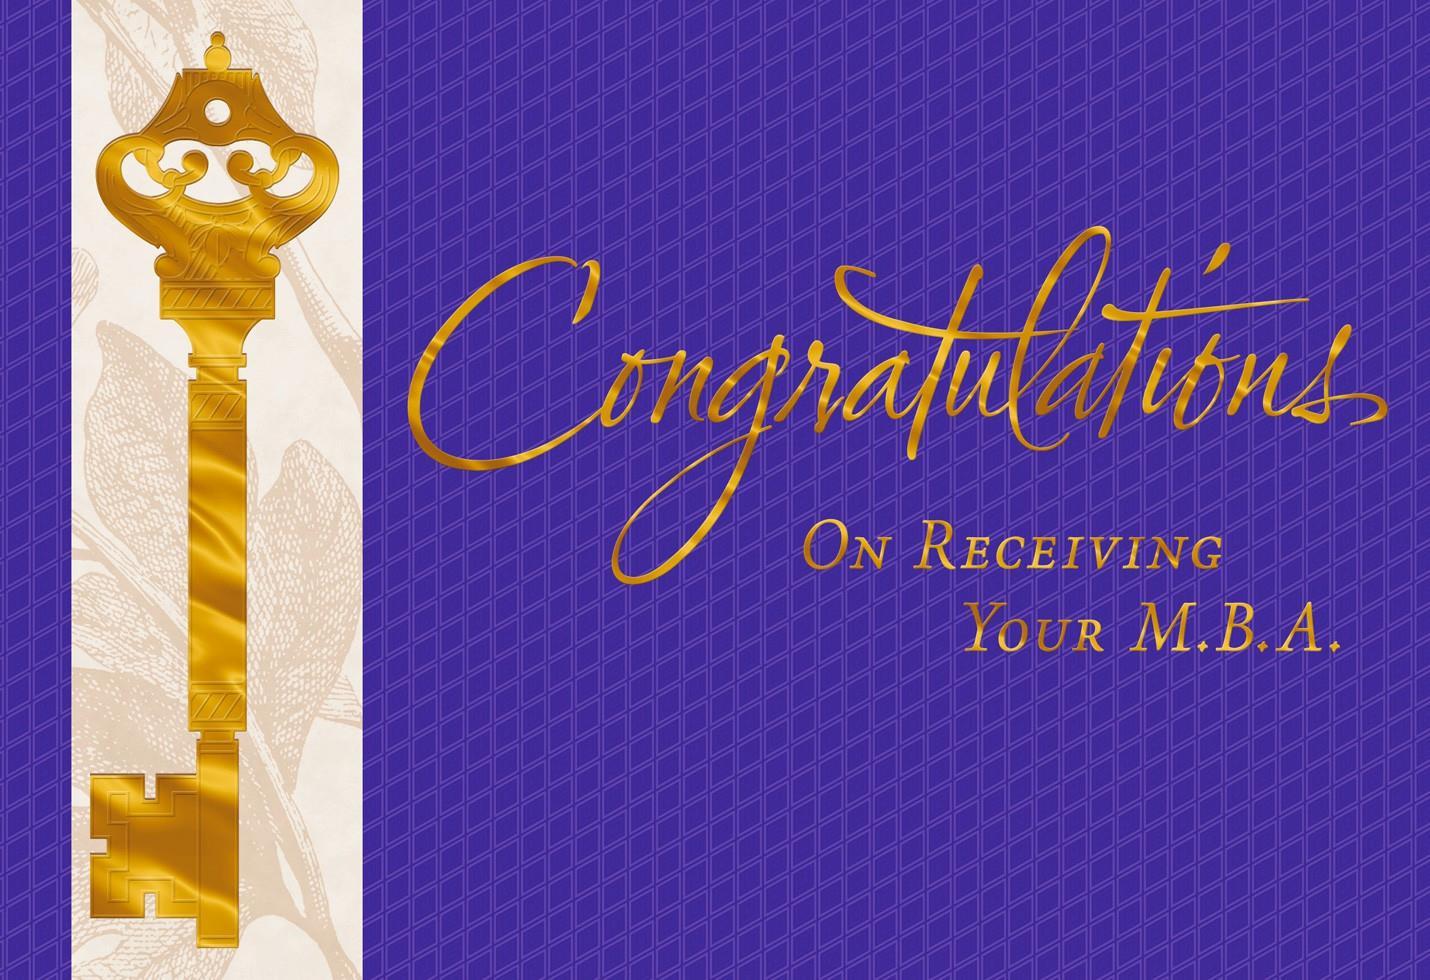 Golden Key Mba Graduation Card Greeting Cards Hallmark